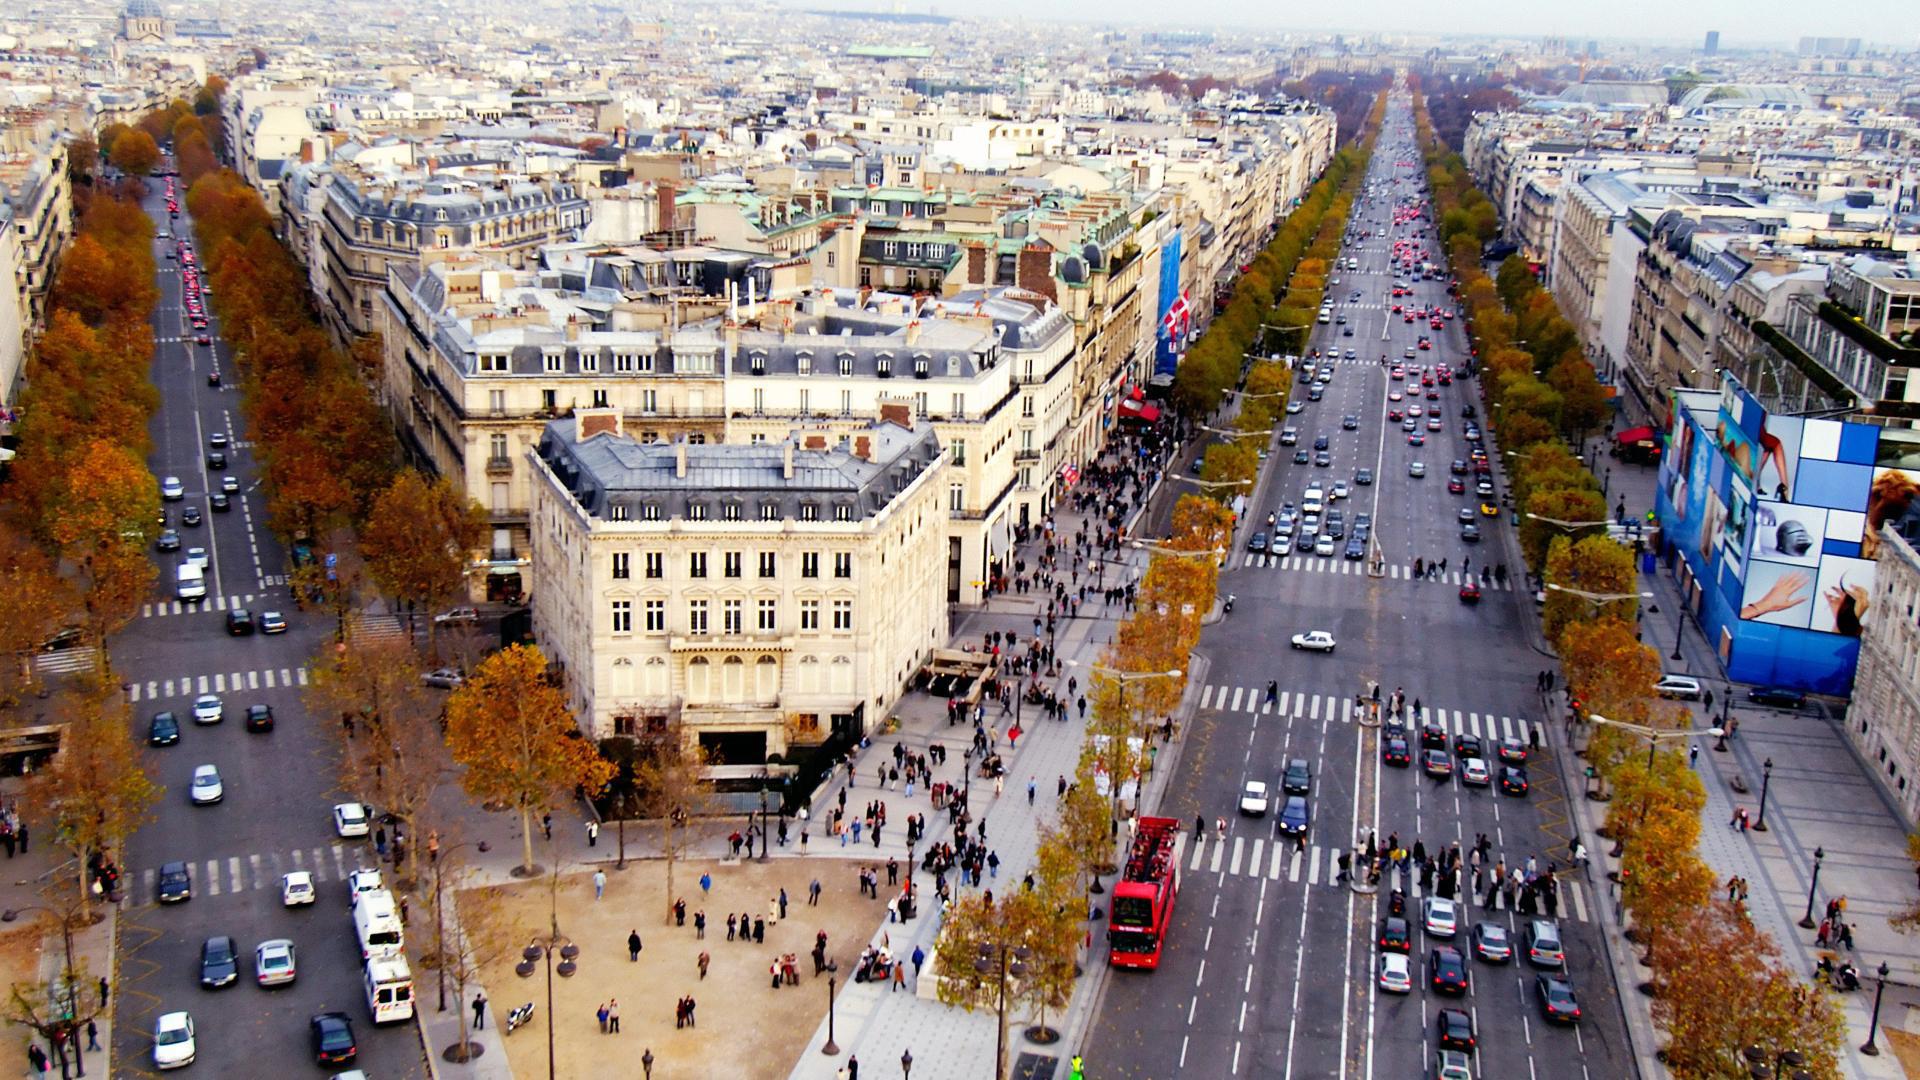 Champs-Elysees-Paris-France.jpg